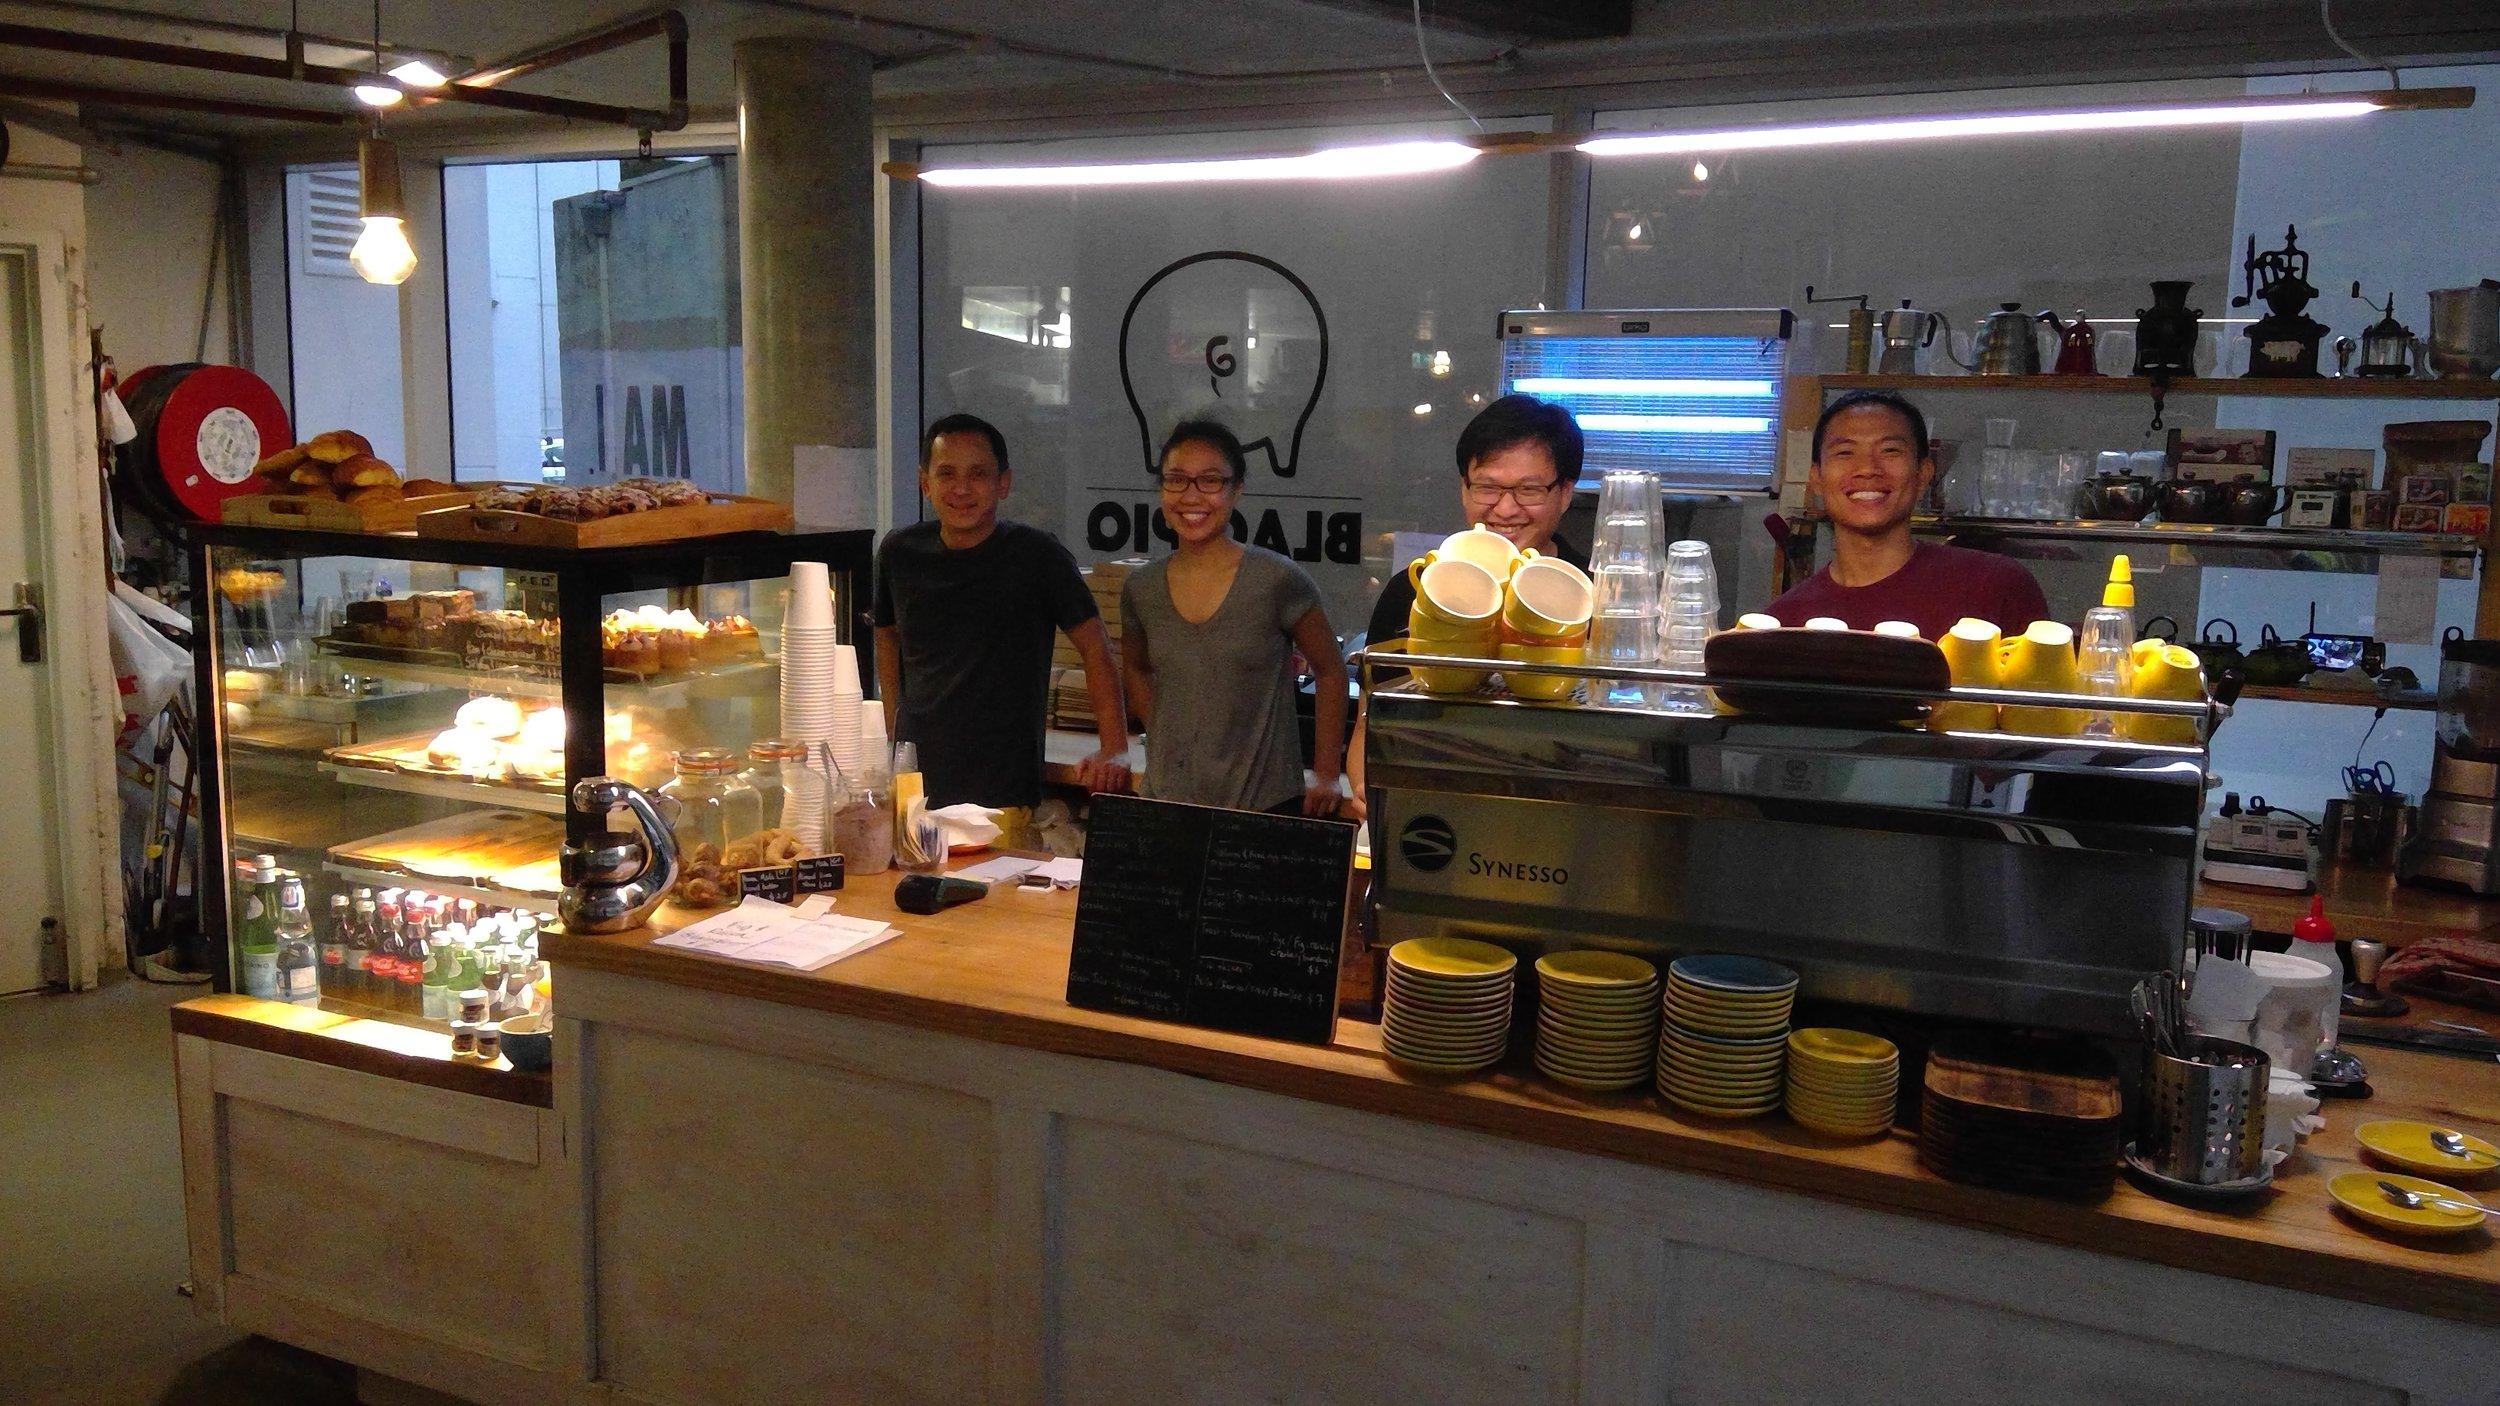 Happily working at  Blaq Piq  in Sydney's CBD